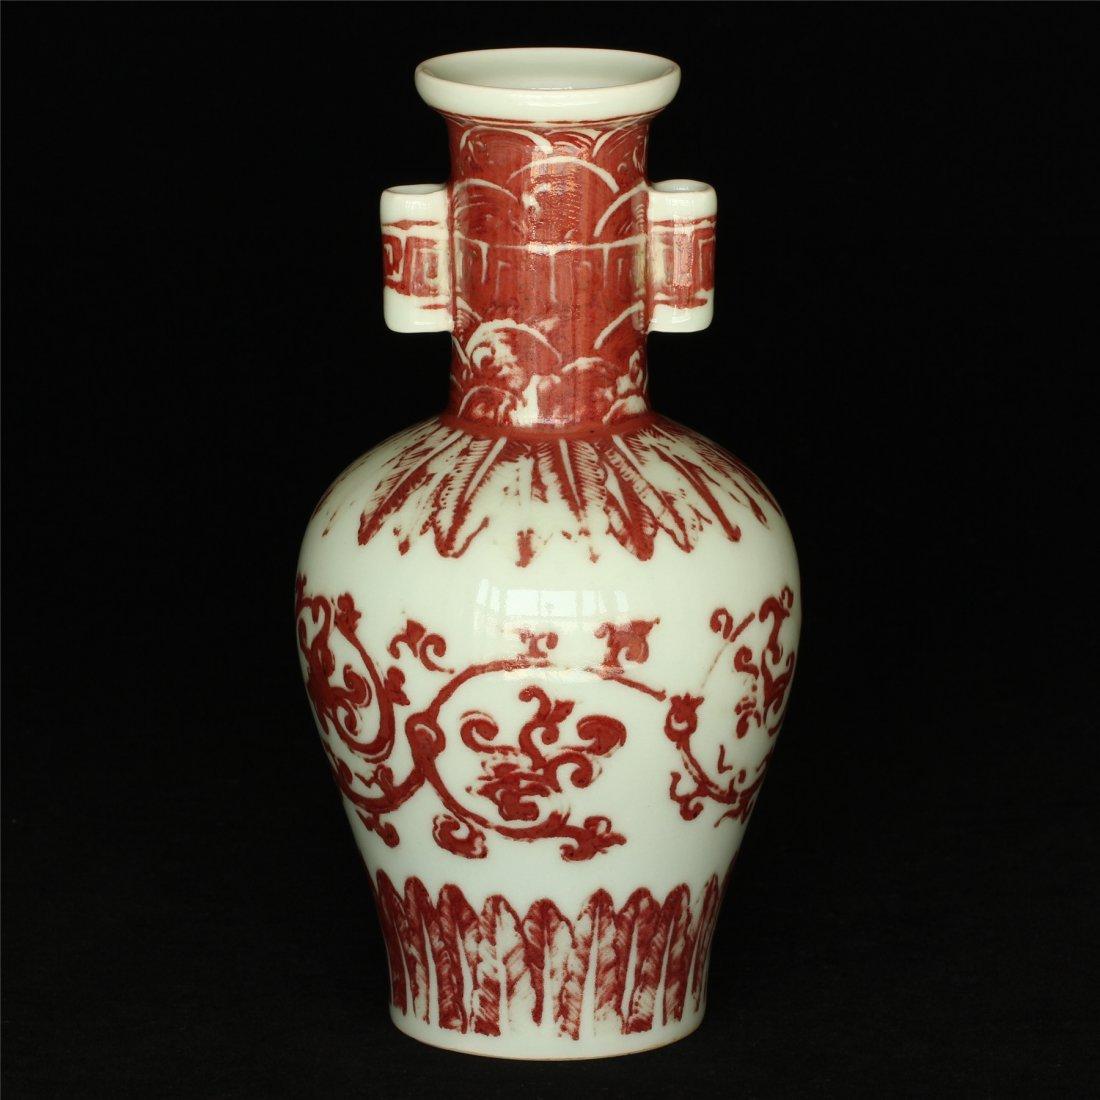 Underglaze red porcelain vase of Qing Dynasty QianLong - 10